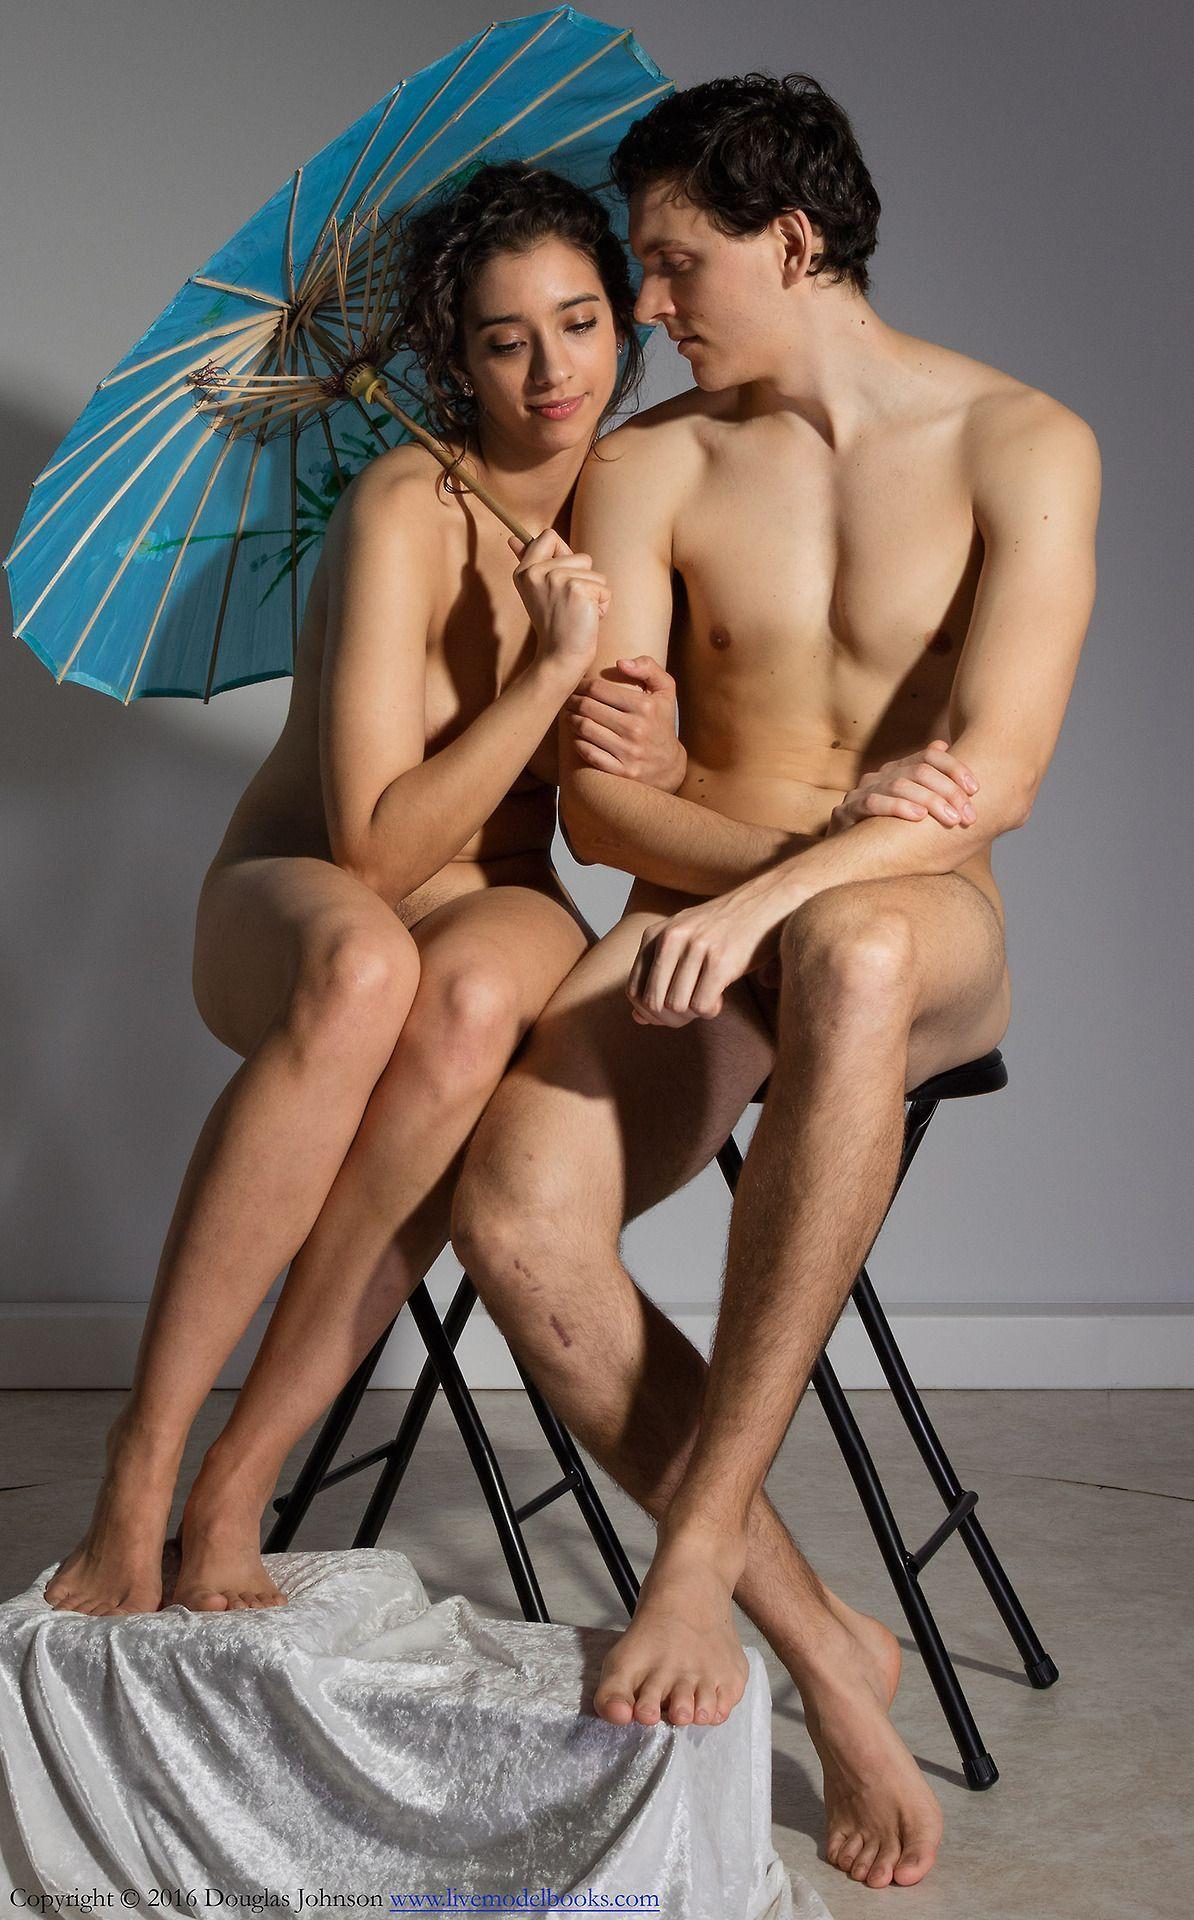 Nude girls doing sex photoshoot